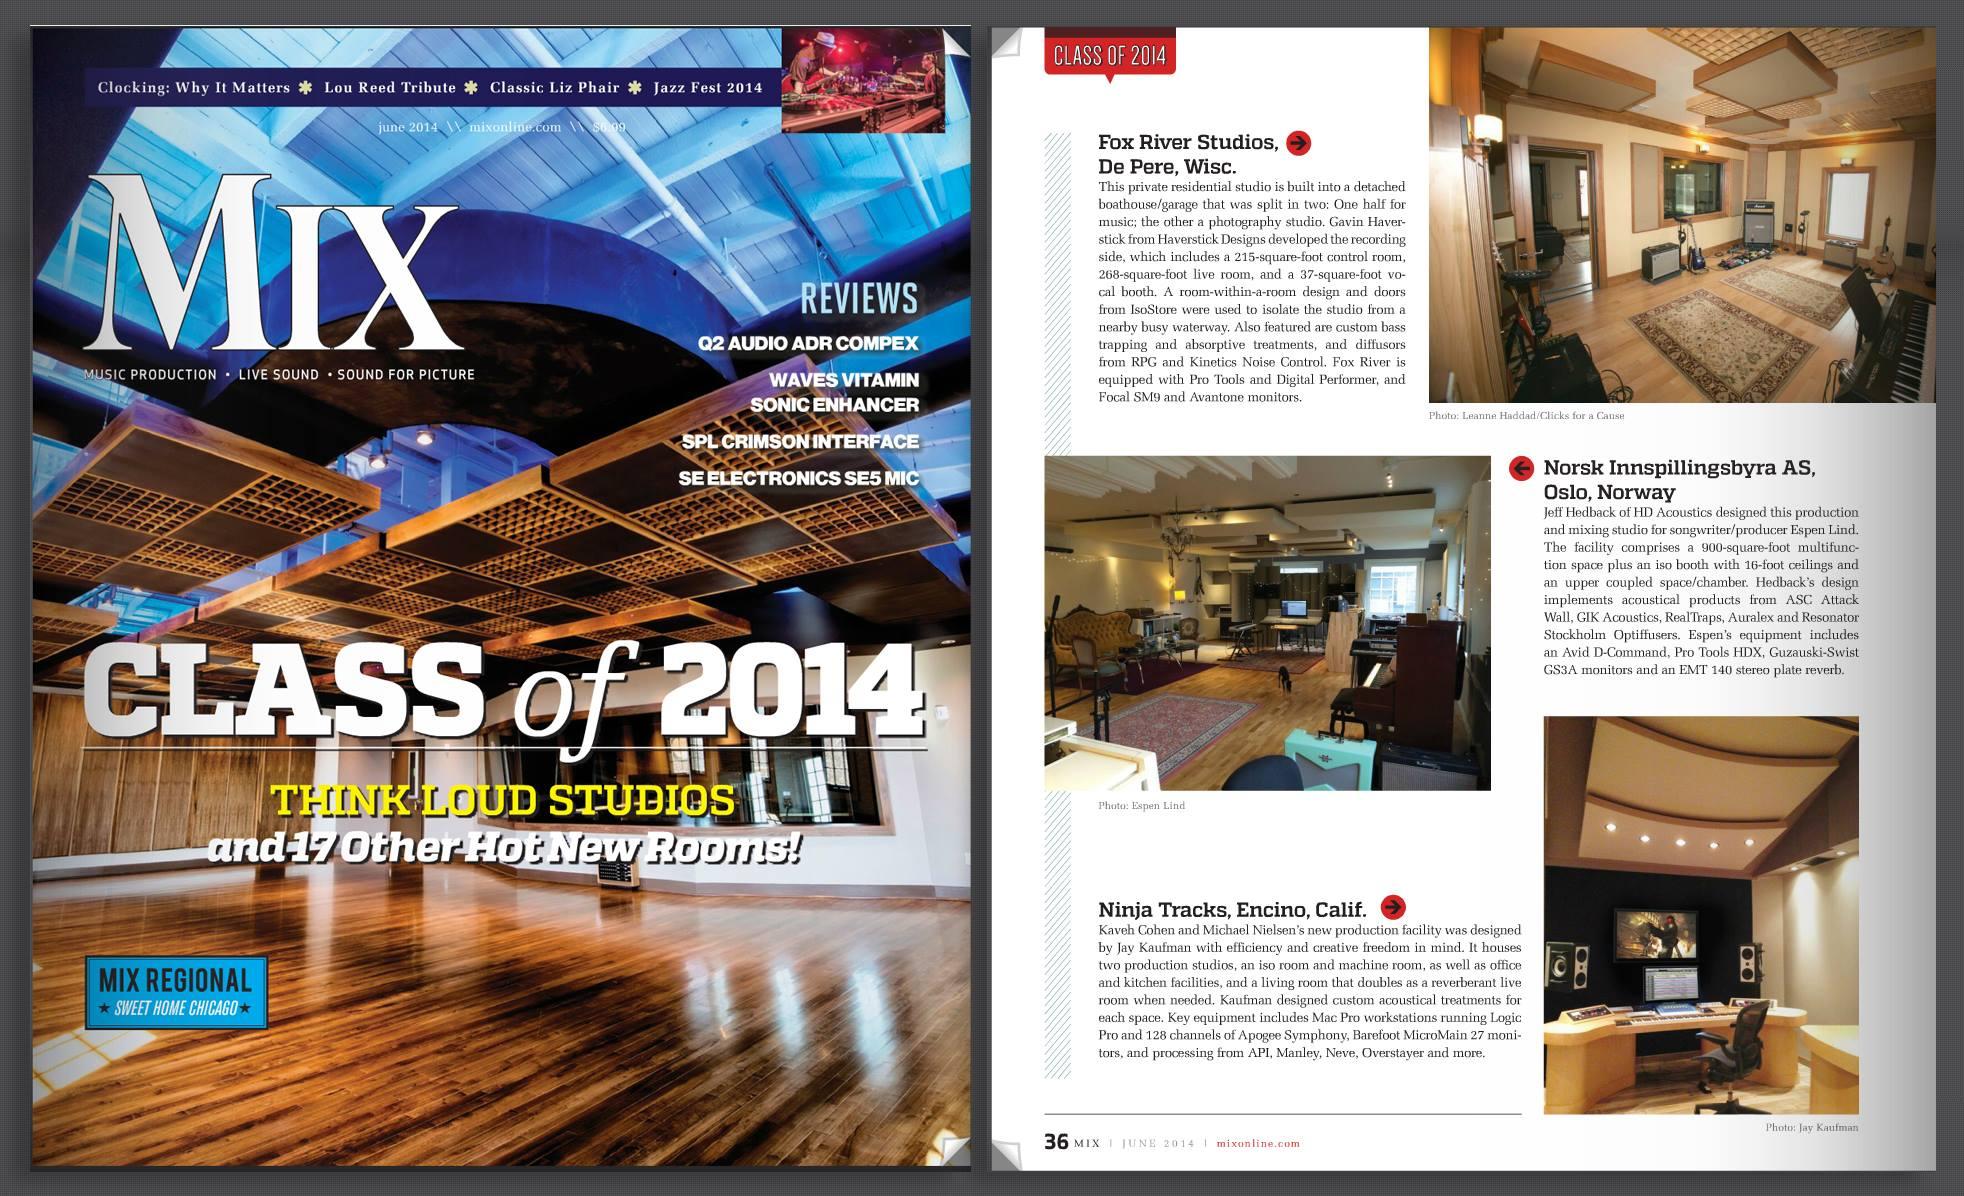 Ninja HQ featured in Mix Magazine